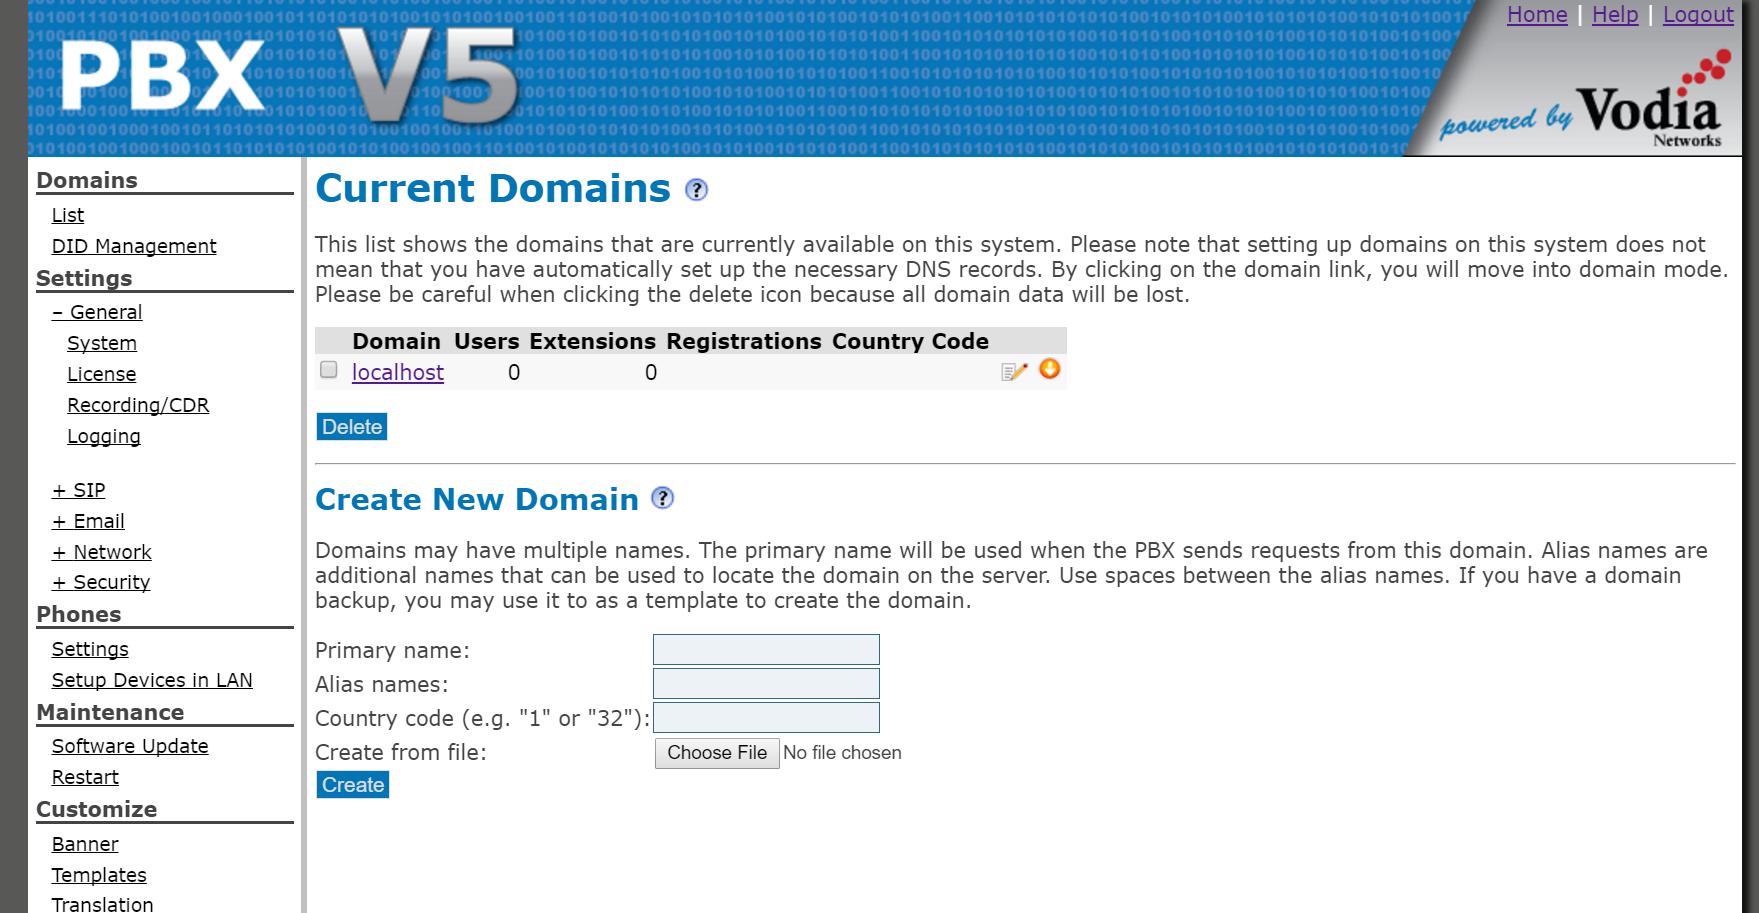 Current domains